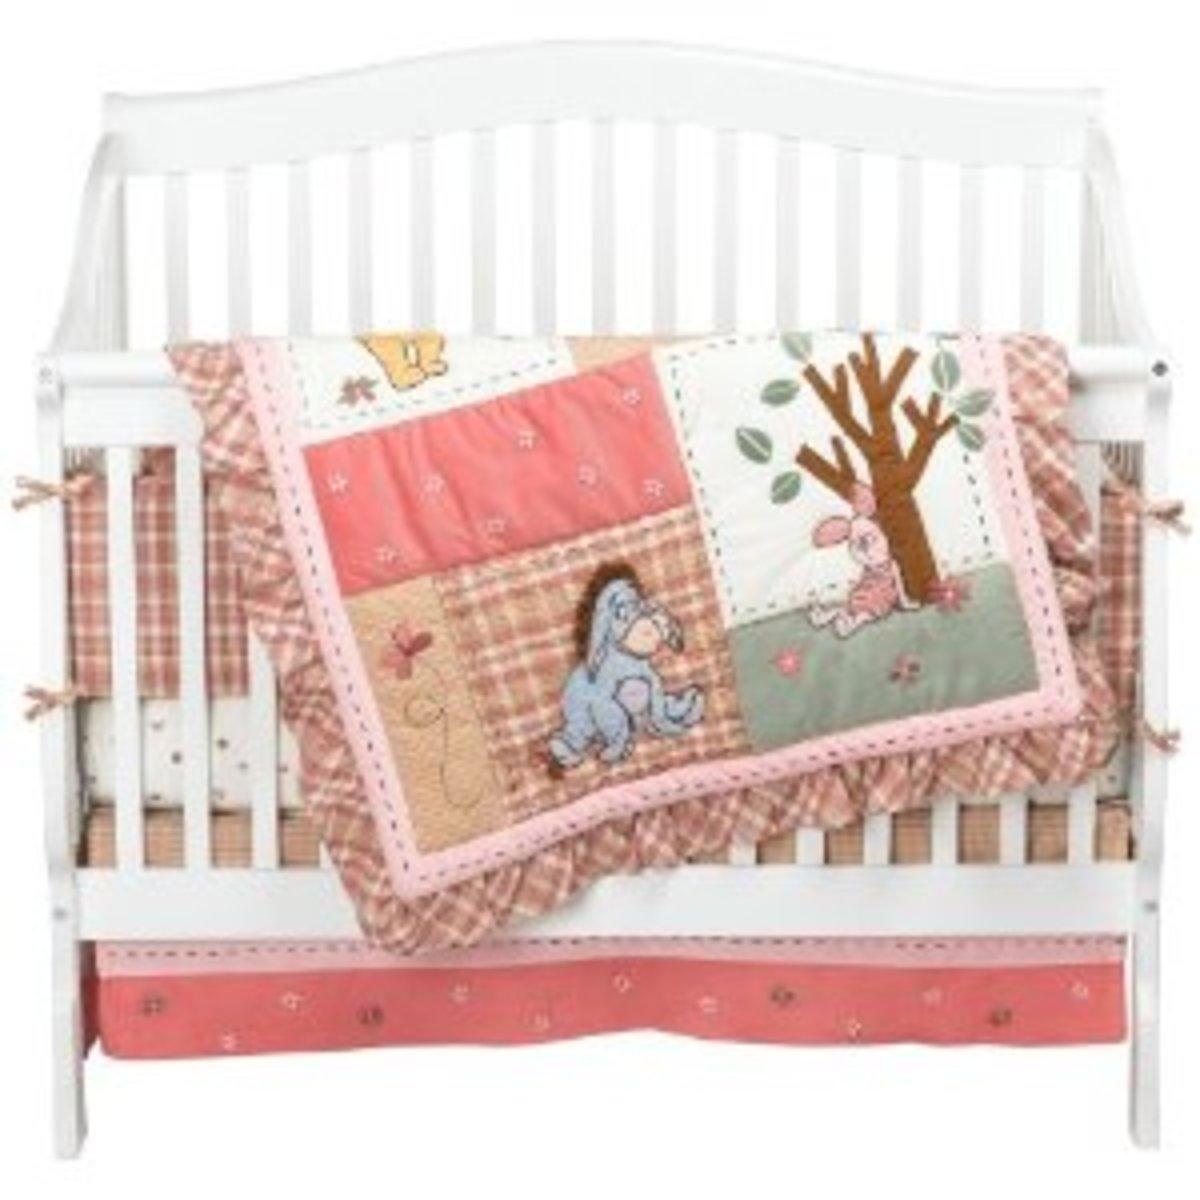 Disney Crib Bedding Set, Create A Disney Theme Baby Boy or Girl Nursery, Mickey Mouse and More